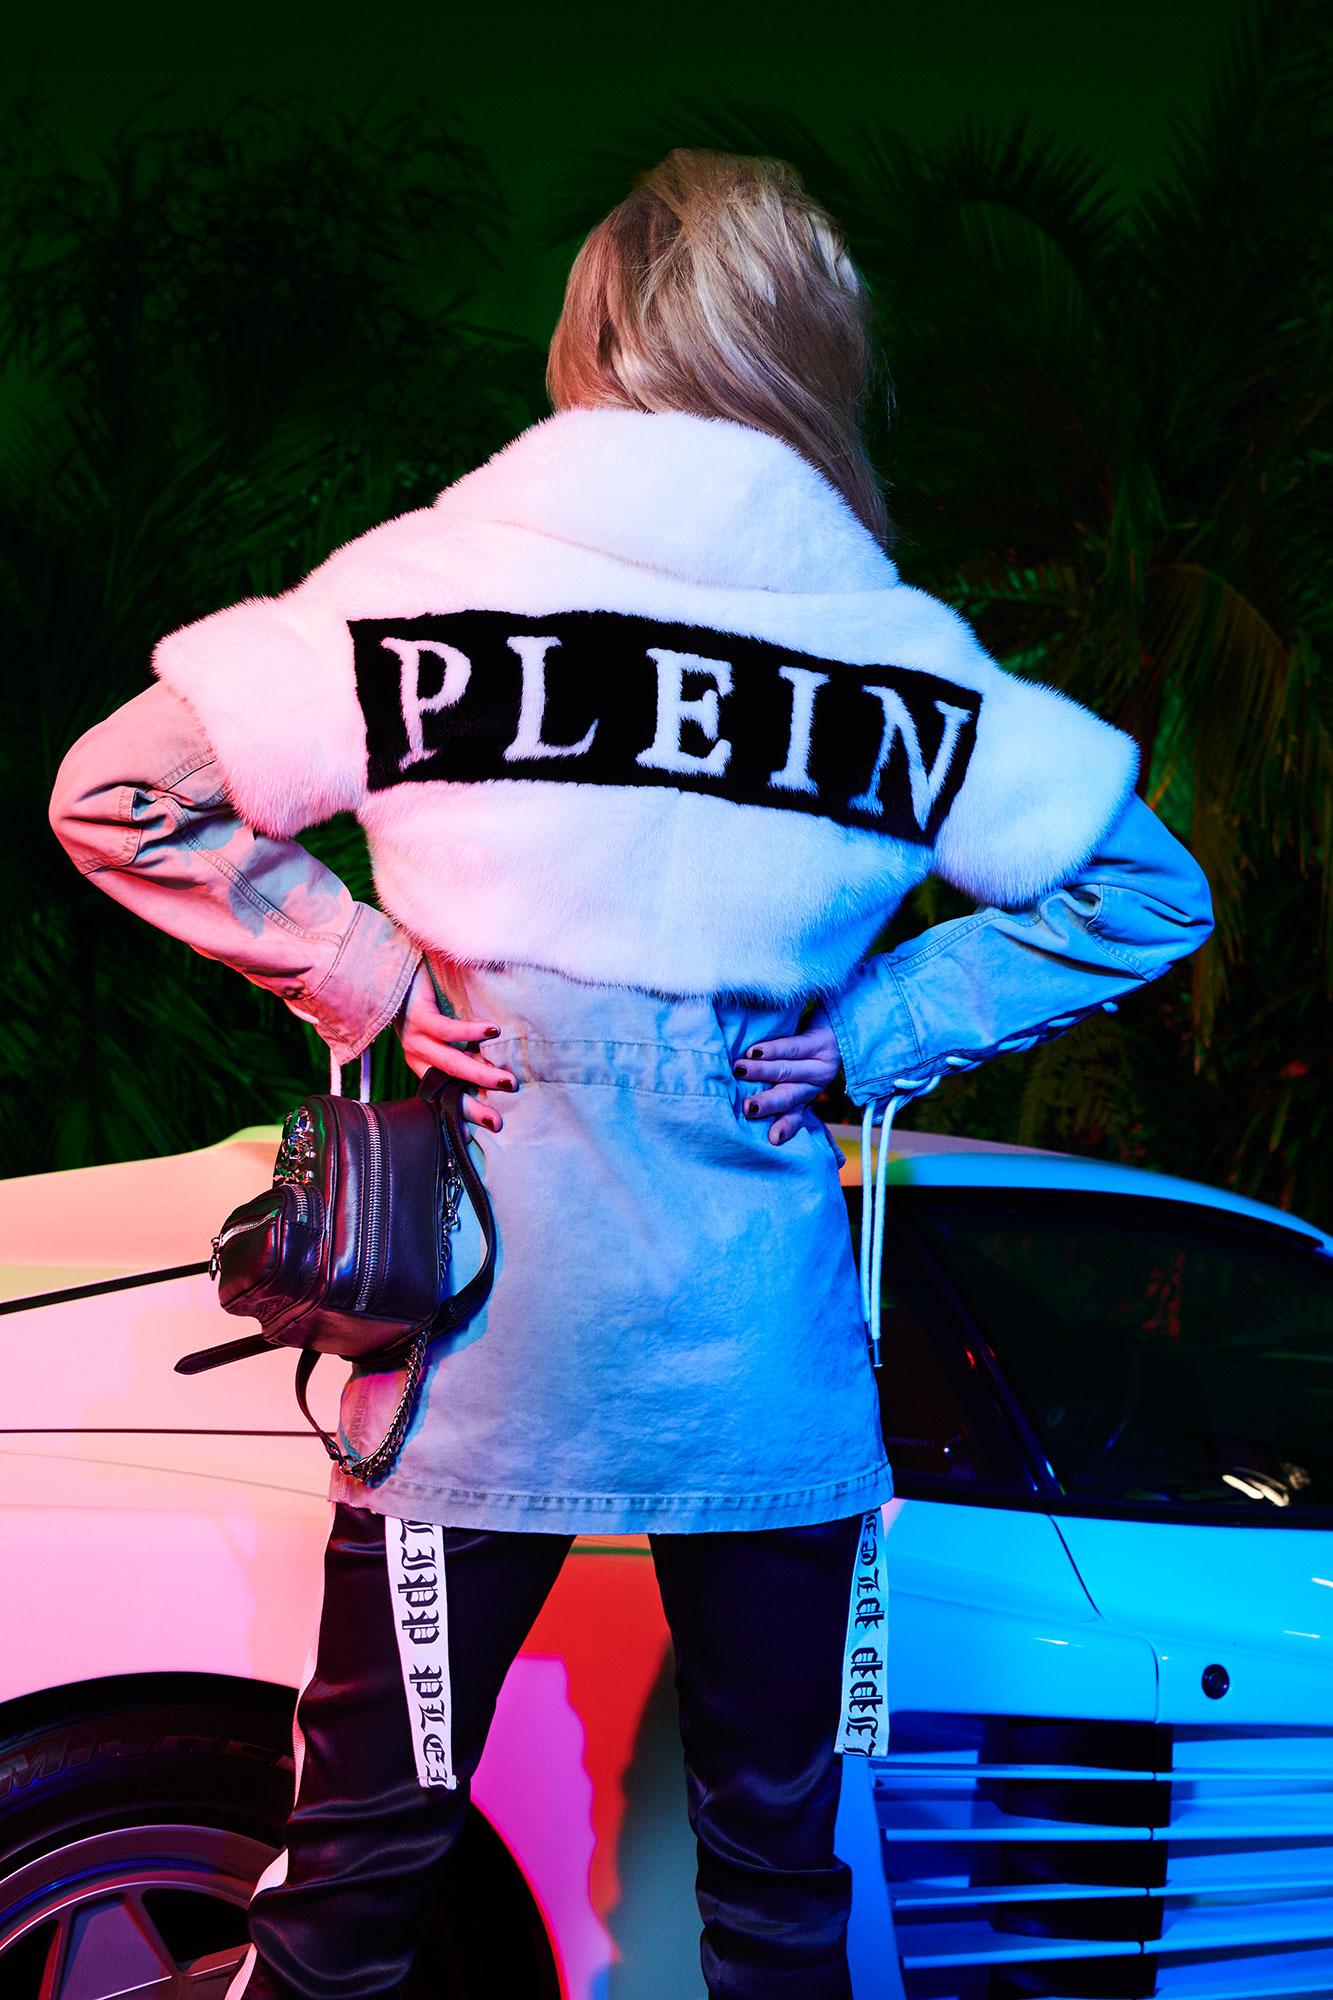 Philip Plein Pre-Fall 2018 | Dylan Don | Philipp Plein | Numerique Retouch Photo Retouching Studio